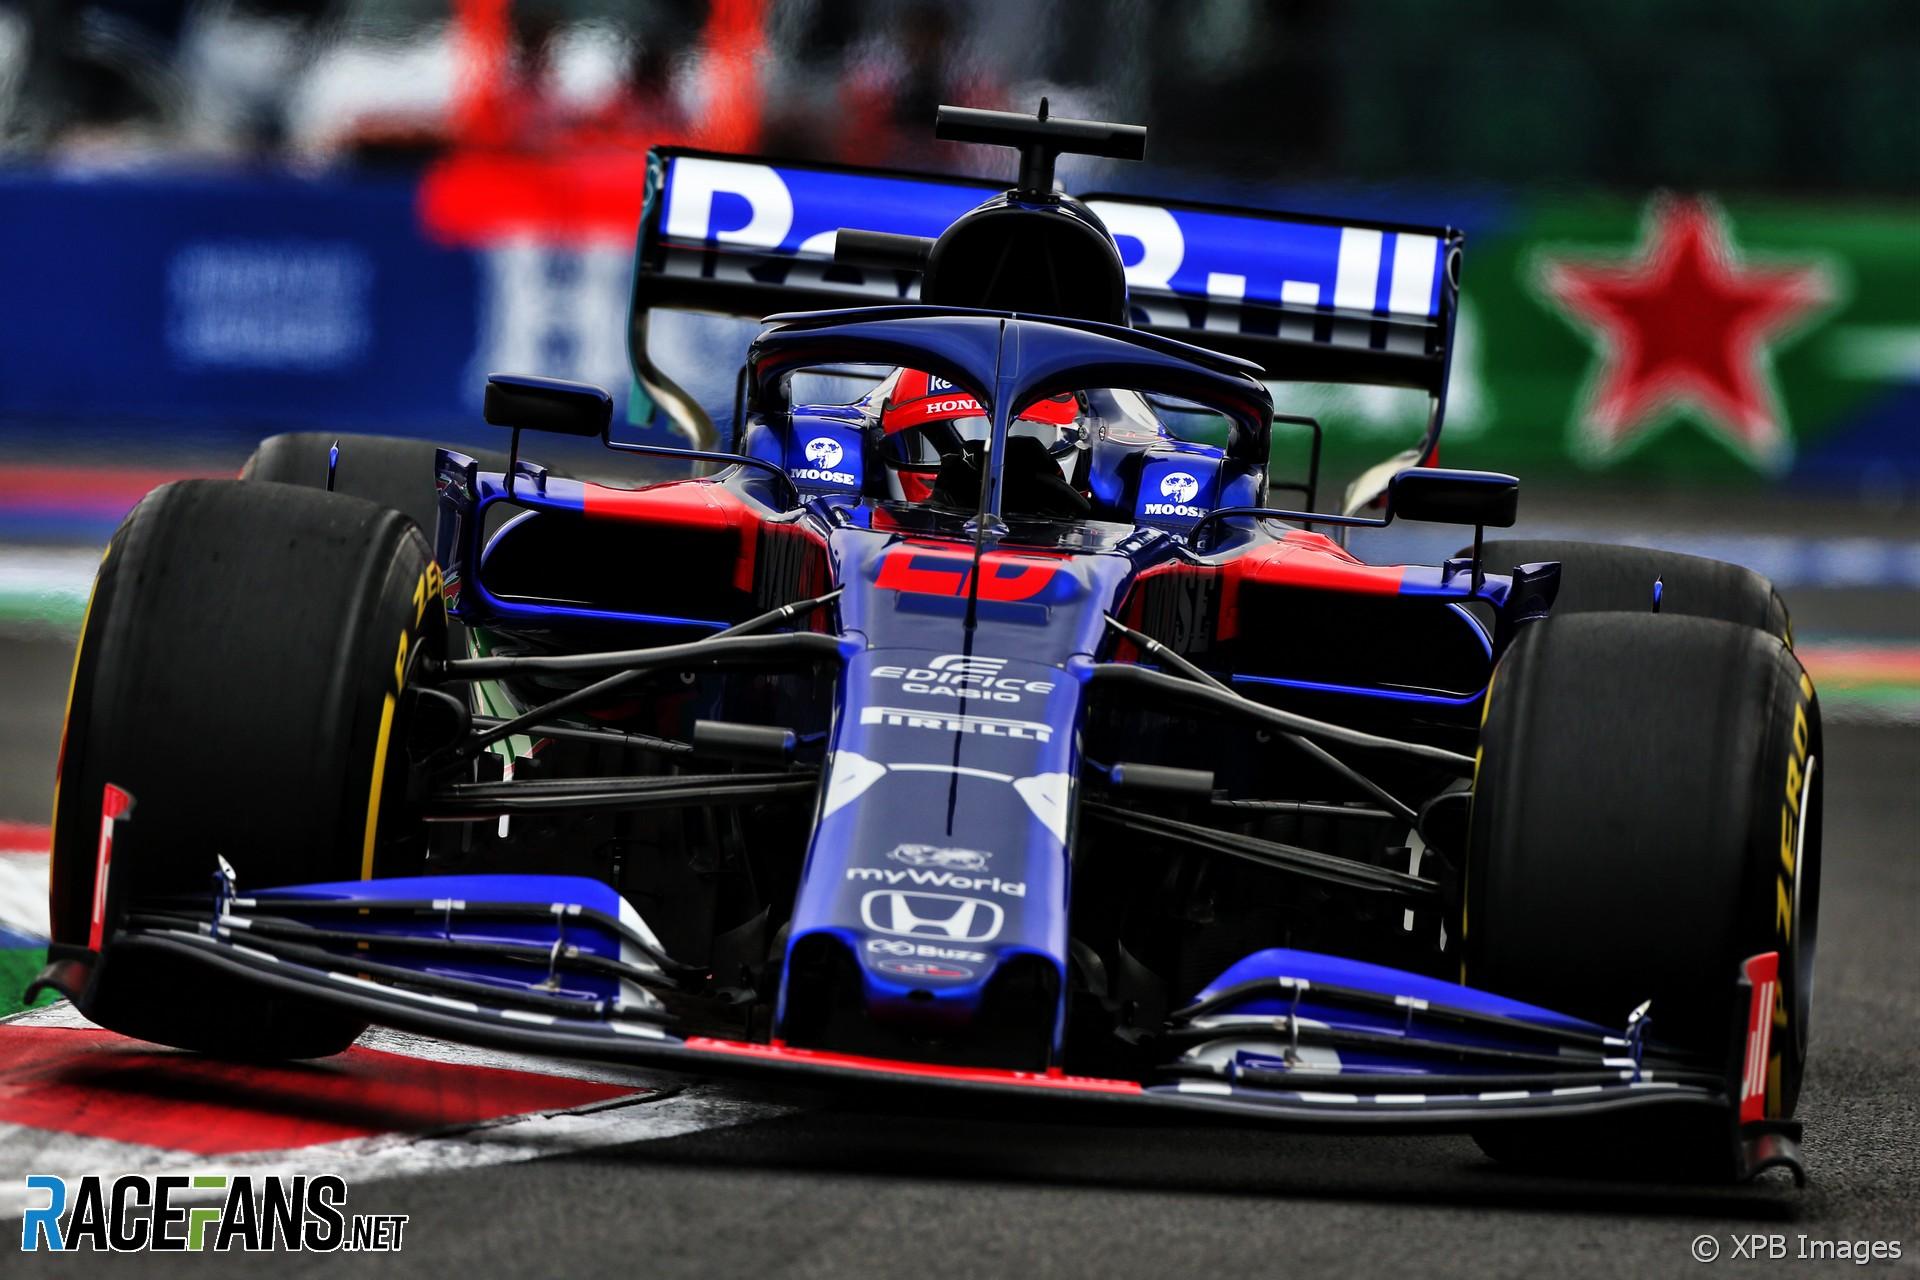 Daniil Kvyat, Toro Rosso, Autodromo Hermanos Rodriguez, 2019